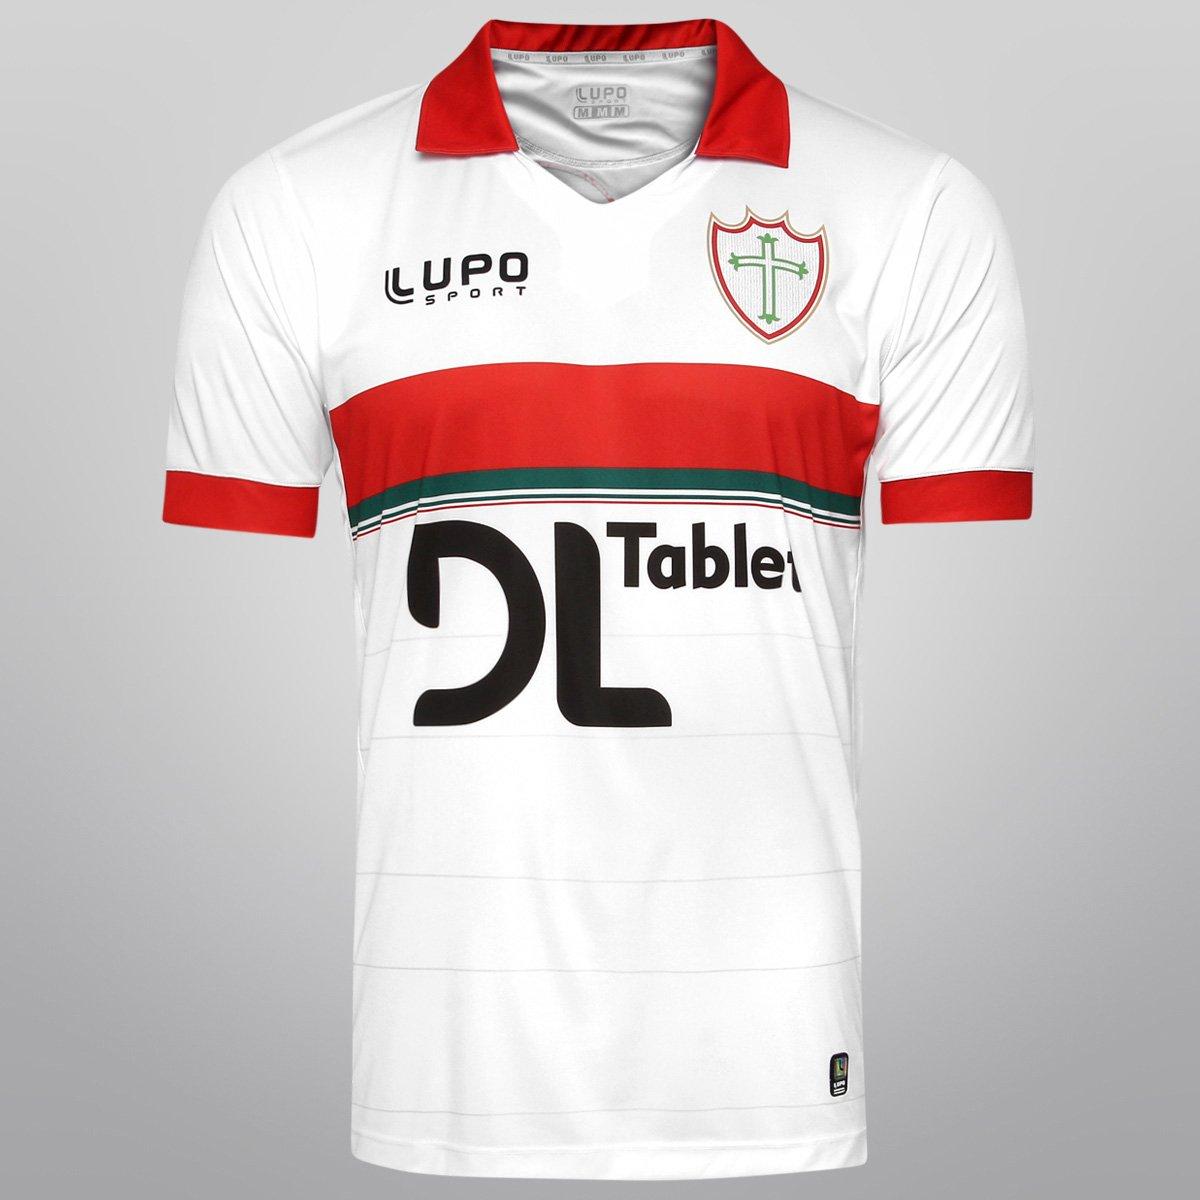 1caff32d9f496 Camisa Lupo Portuguesa II 2014 n° 10 - Compre Agora